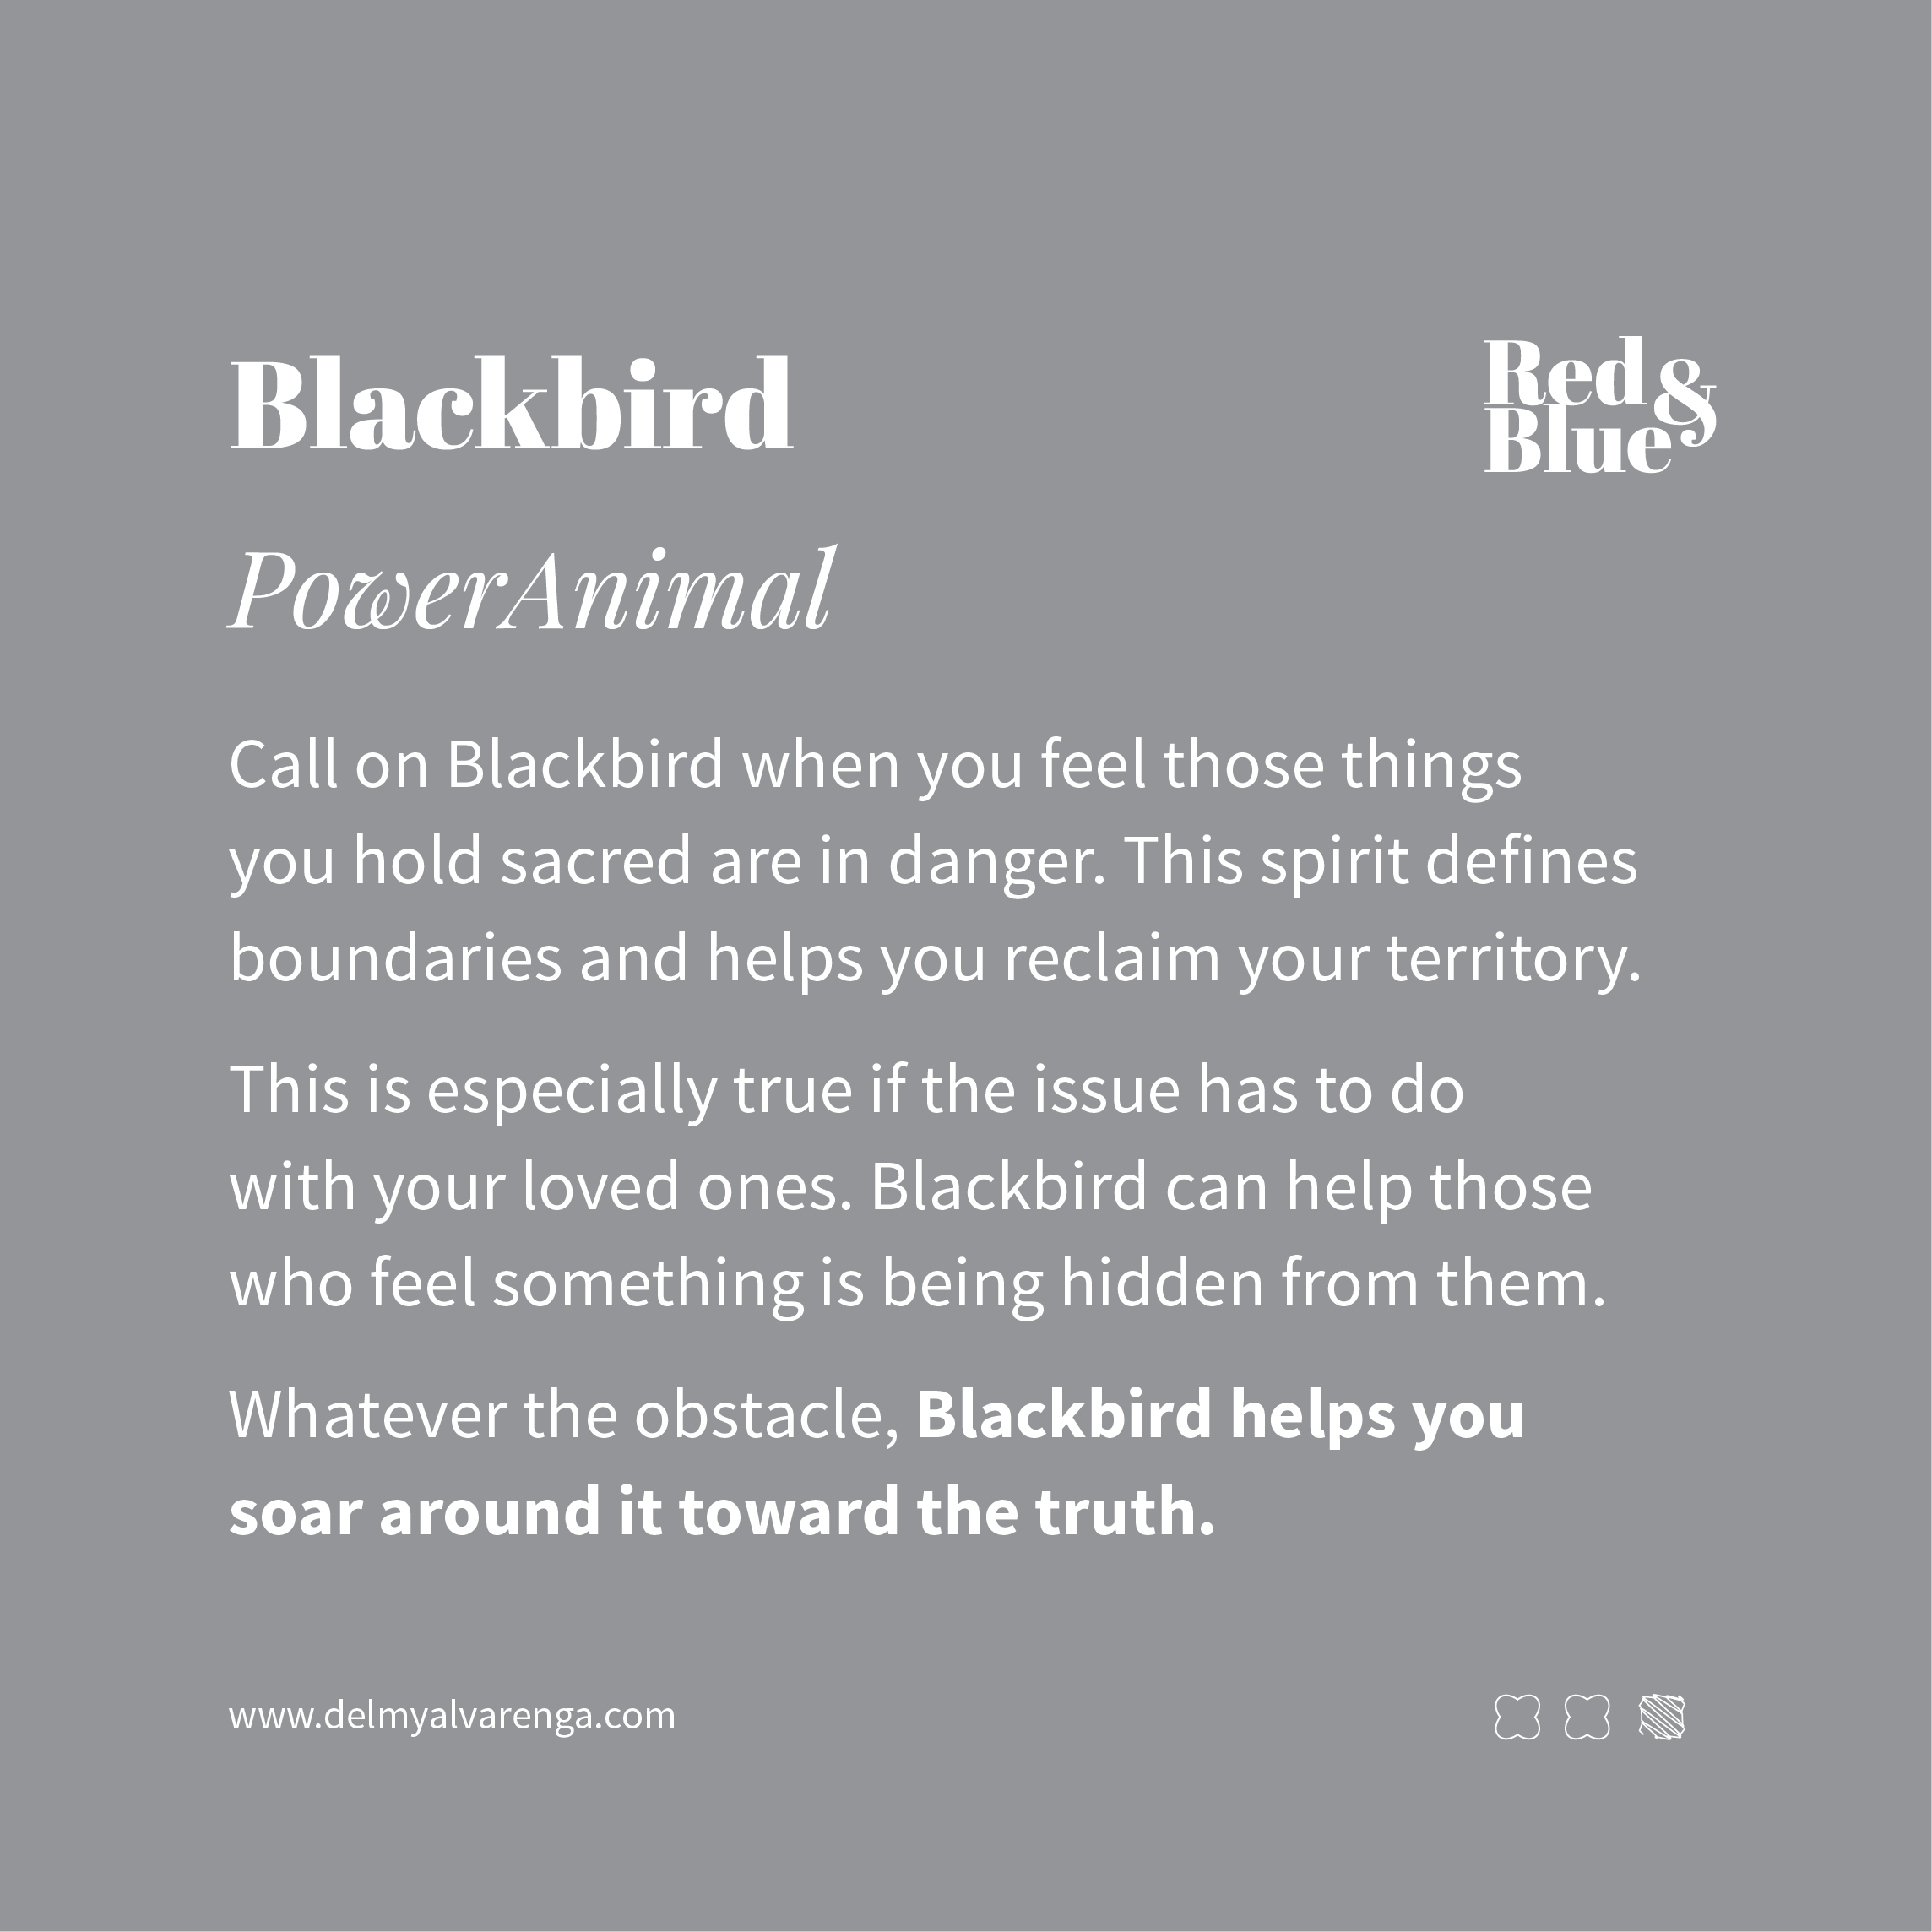 Blackbird Power Animal